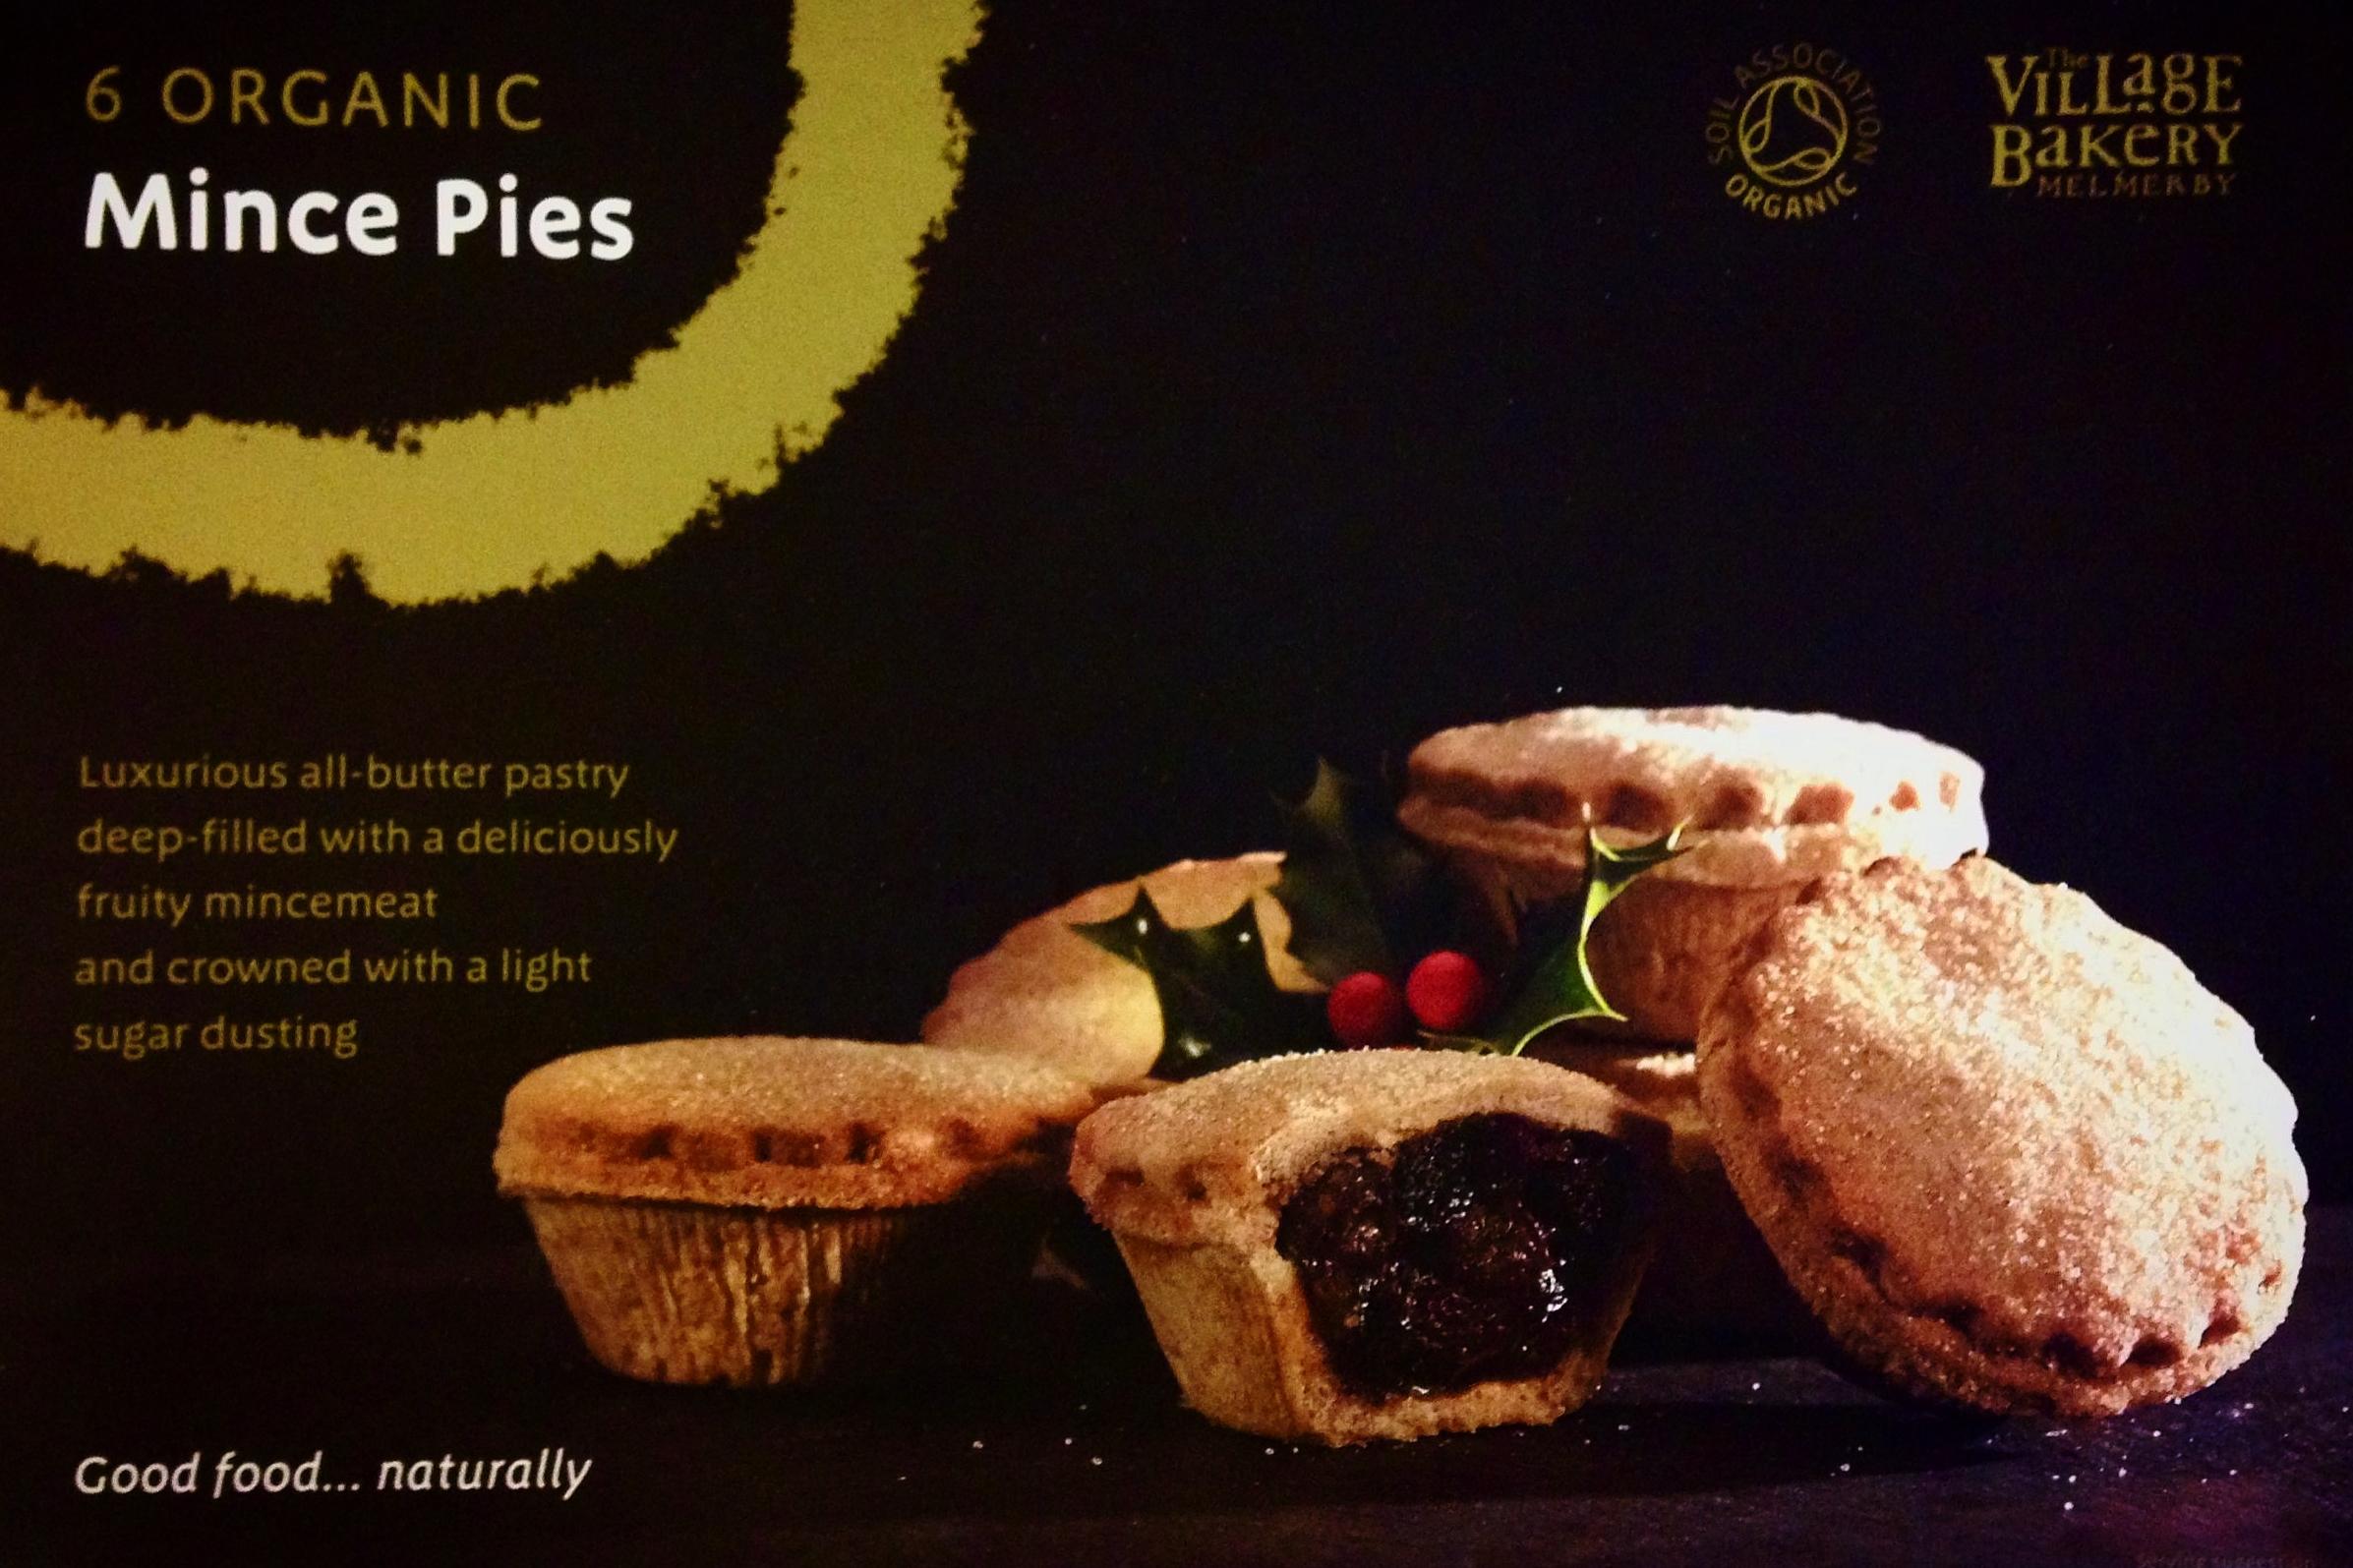 Village Bakery Mince Pies